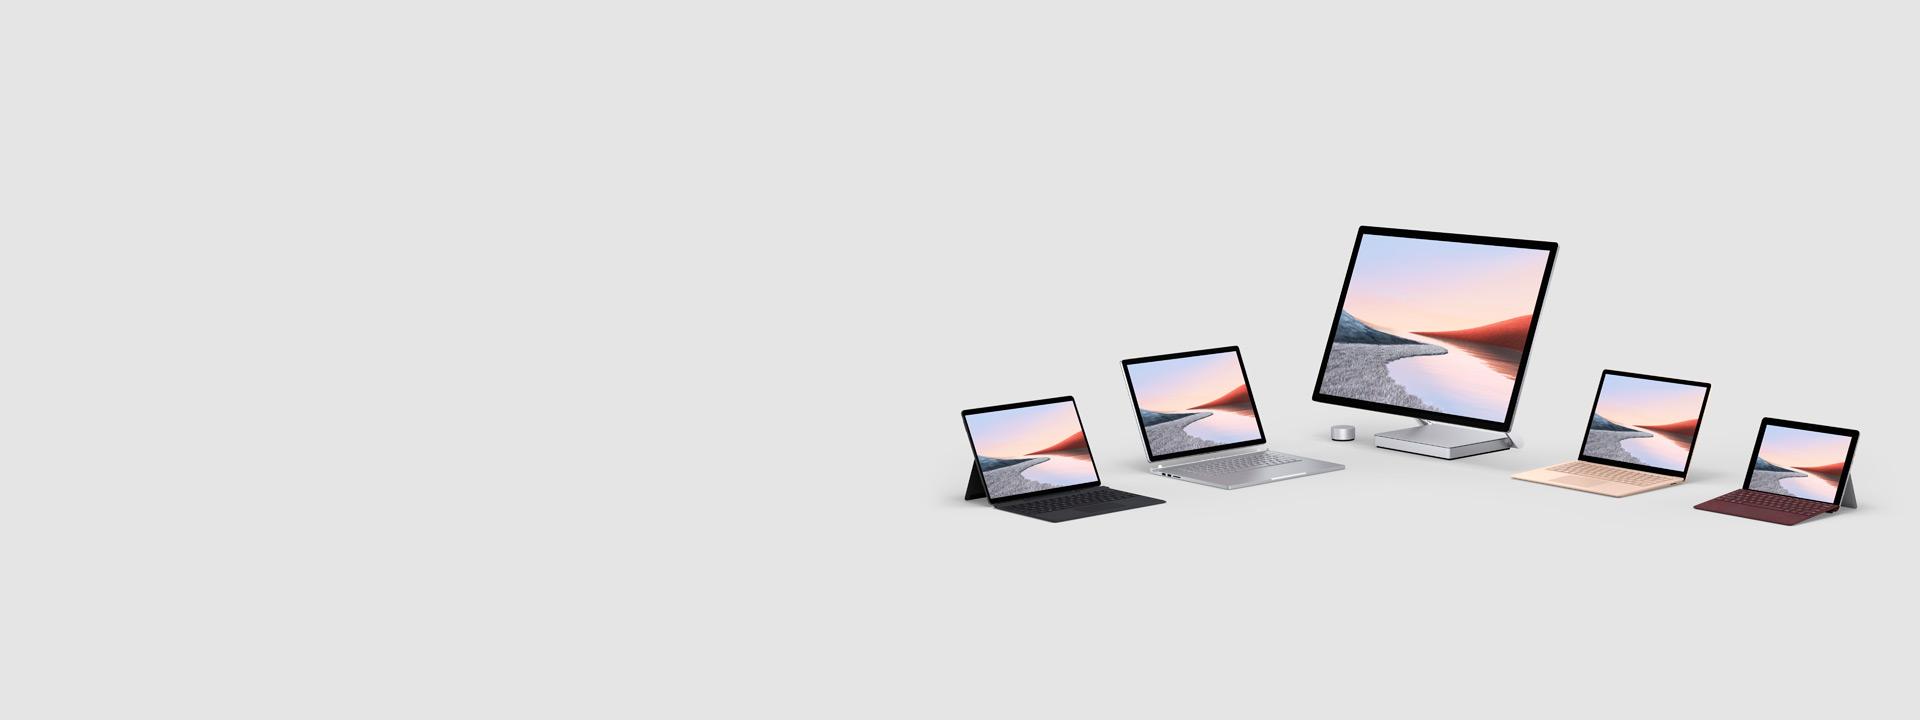 數臺 Surface 電腦,其中包括 Surface Pro 7、Surface Pro X 、Surface Book 2、Surface Studio 2 和 Surface Go